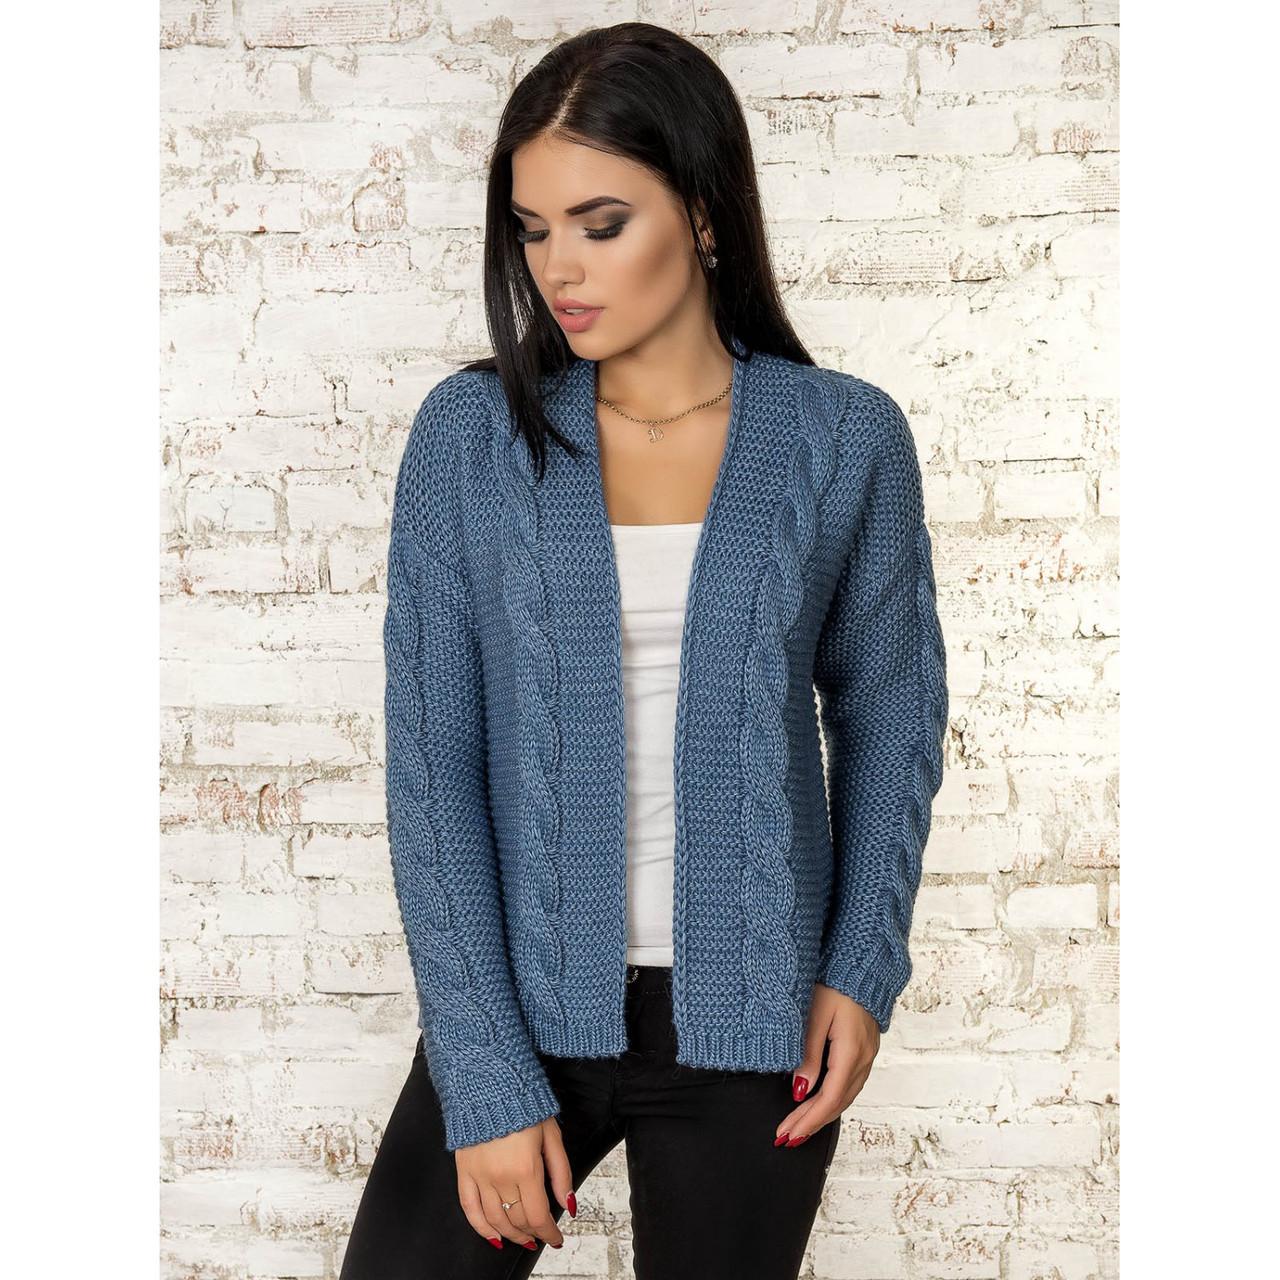 Вязаный кардиган пиджак 42-44-46 размер 5цветов